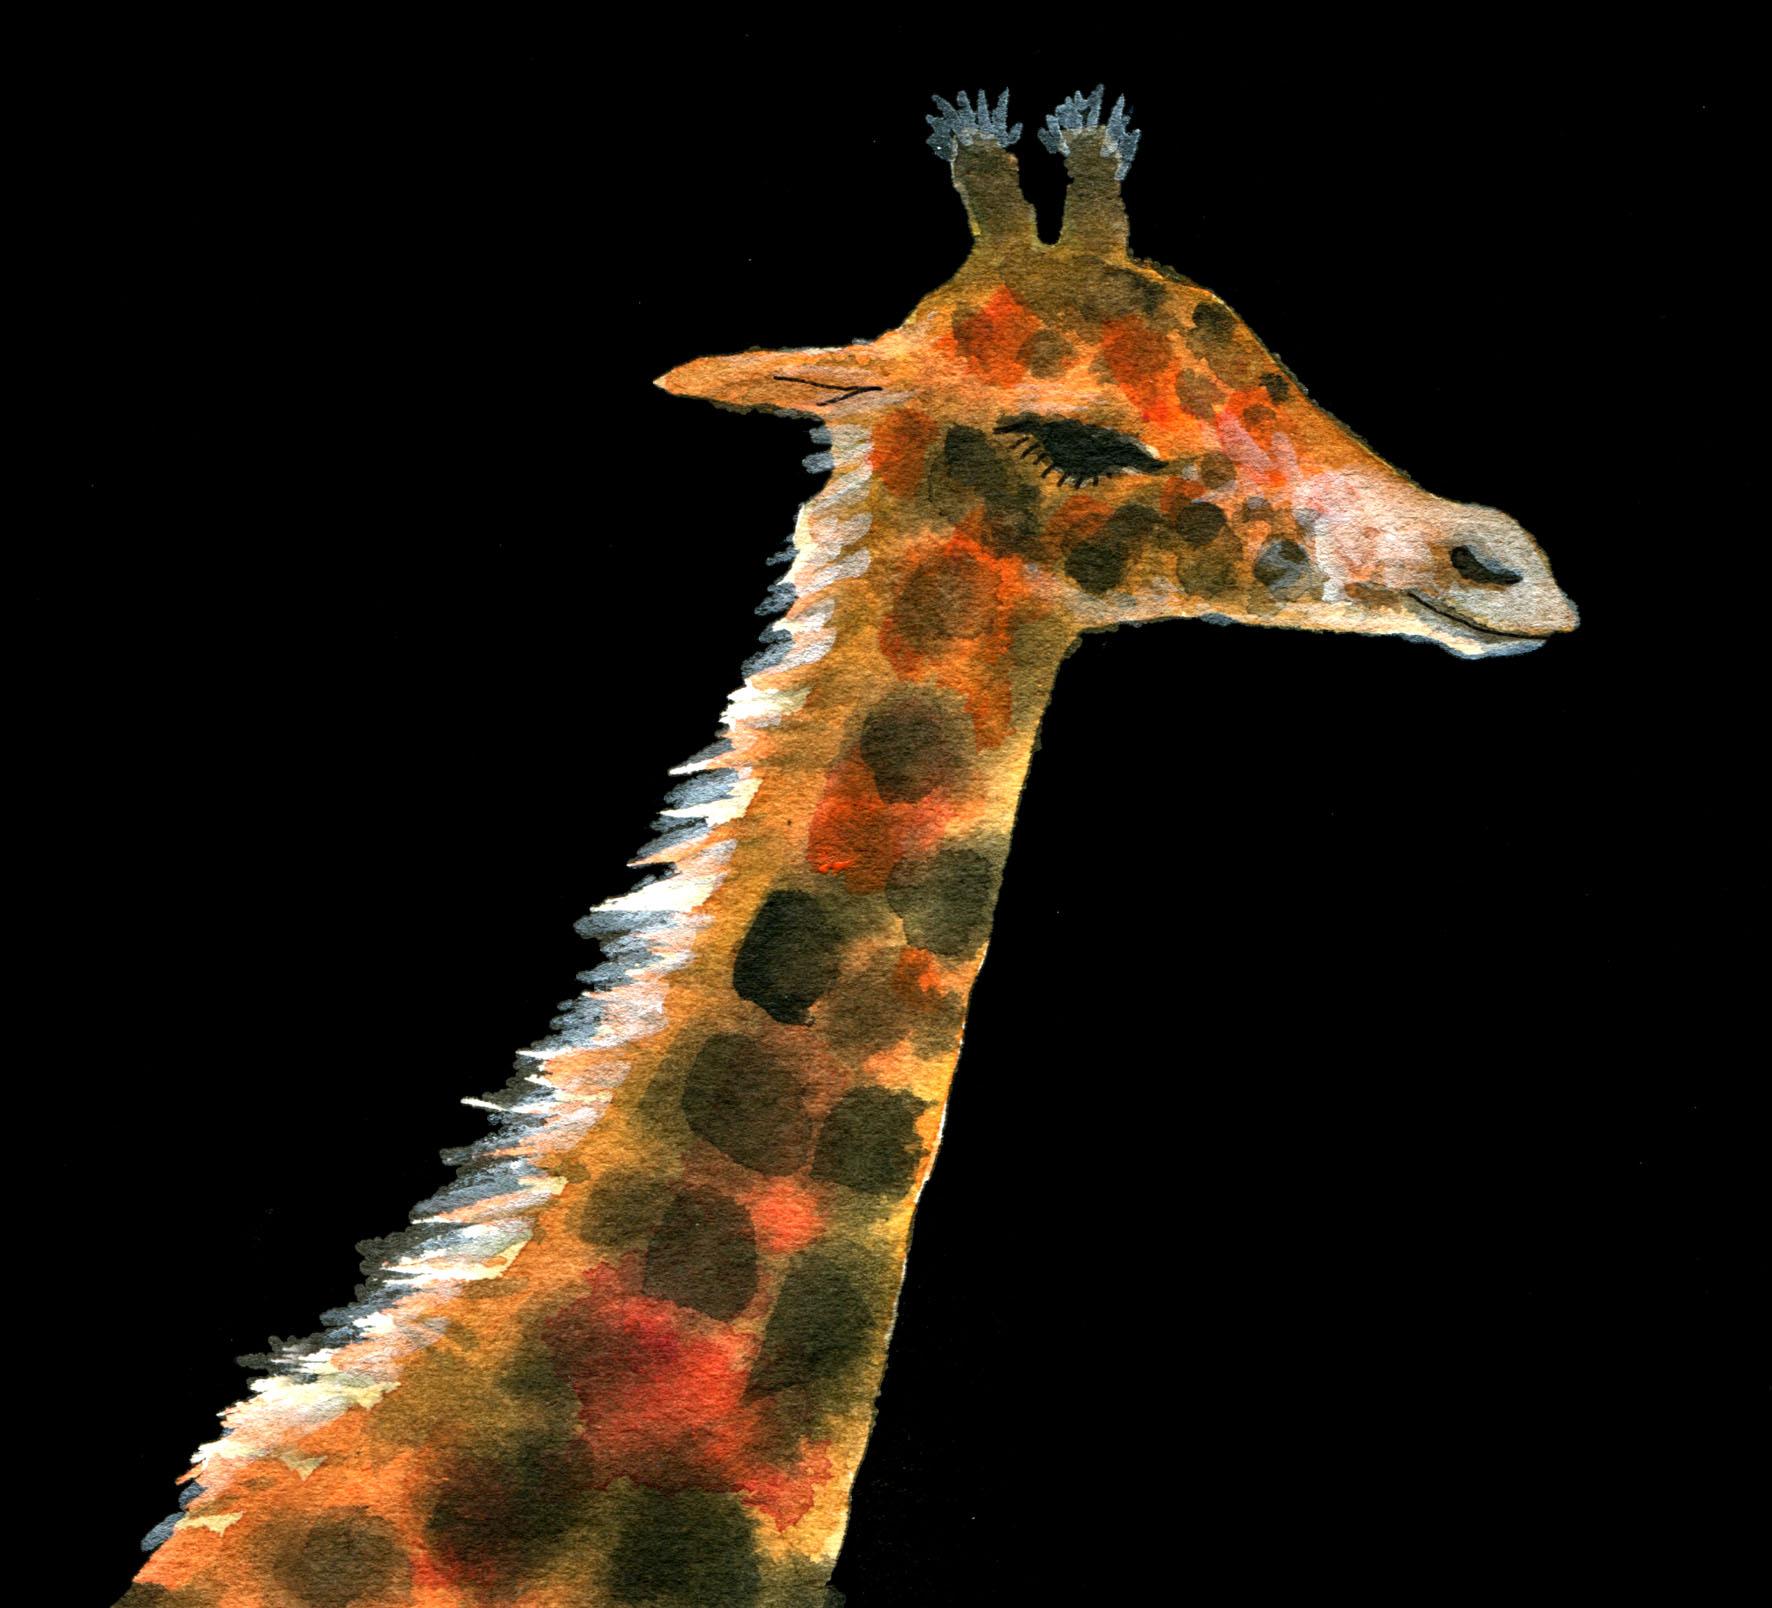 Tomi Giraffe contrasty head judywatsonart lores